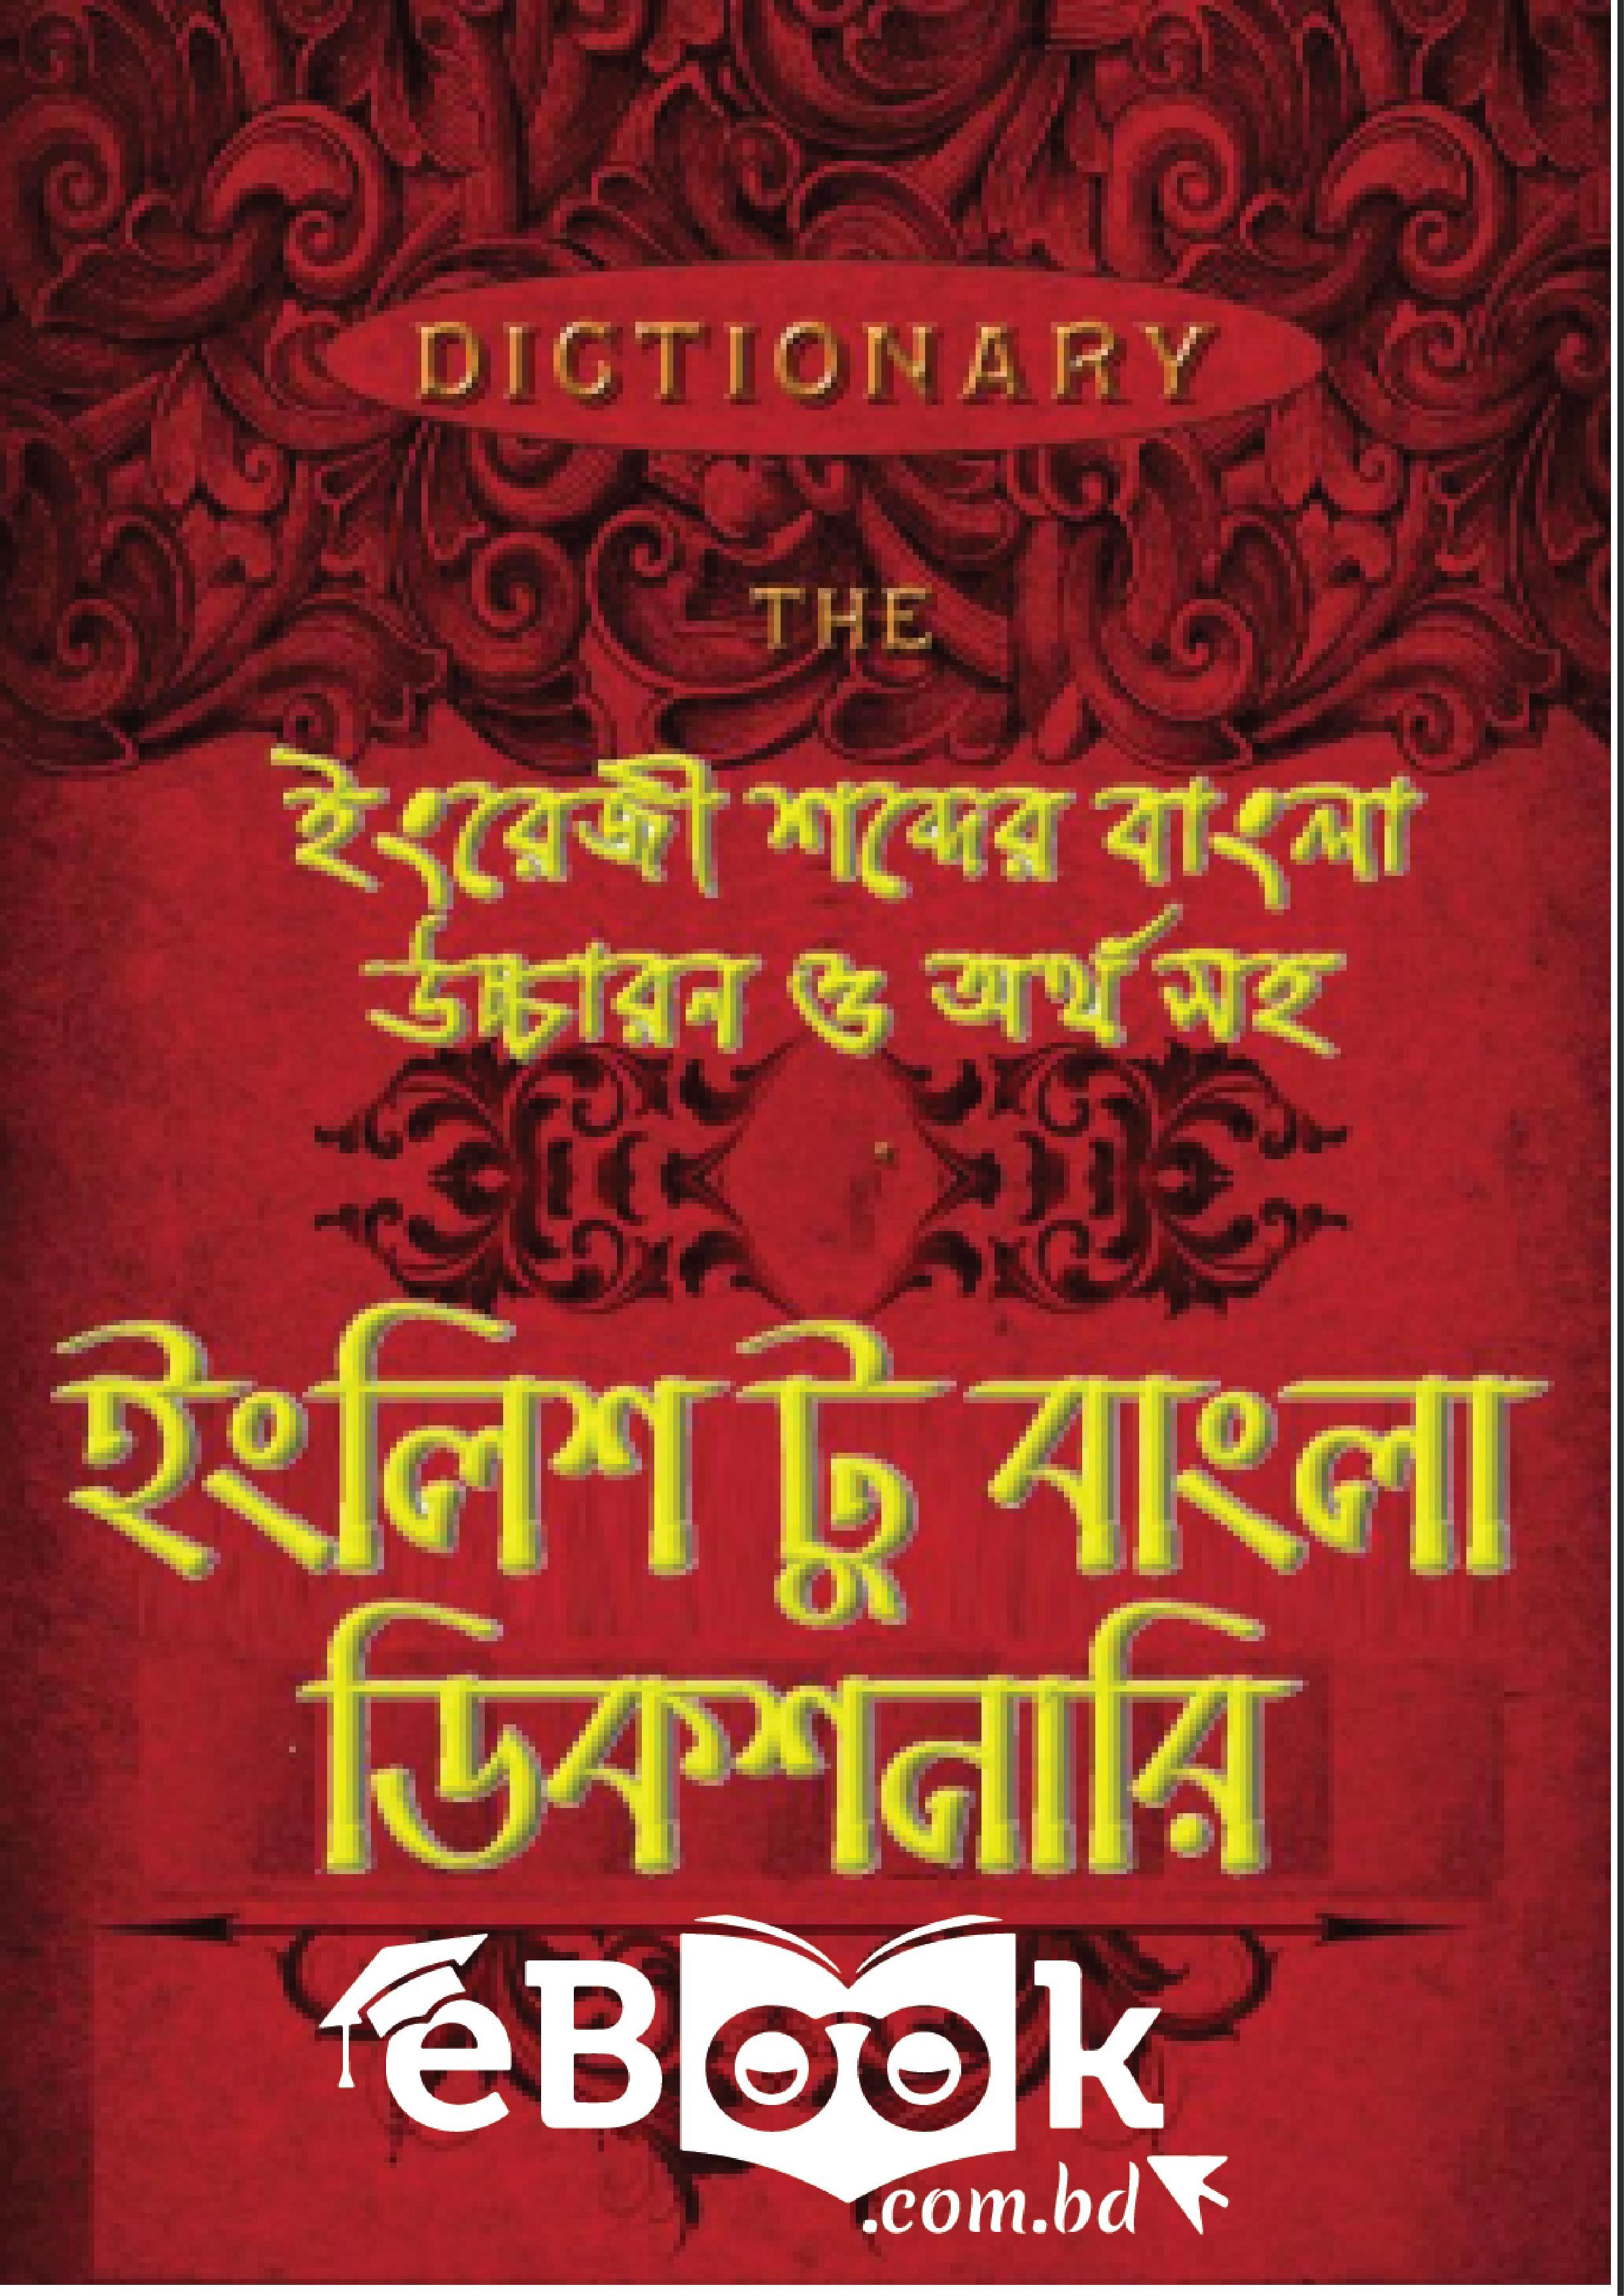 English to Bangla Dictionary With Bangla Text Pronunciation - ইংরেজি থেকে বাংলা অভিধান